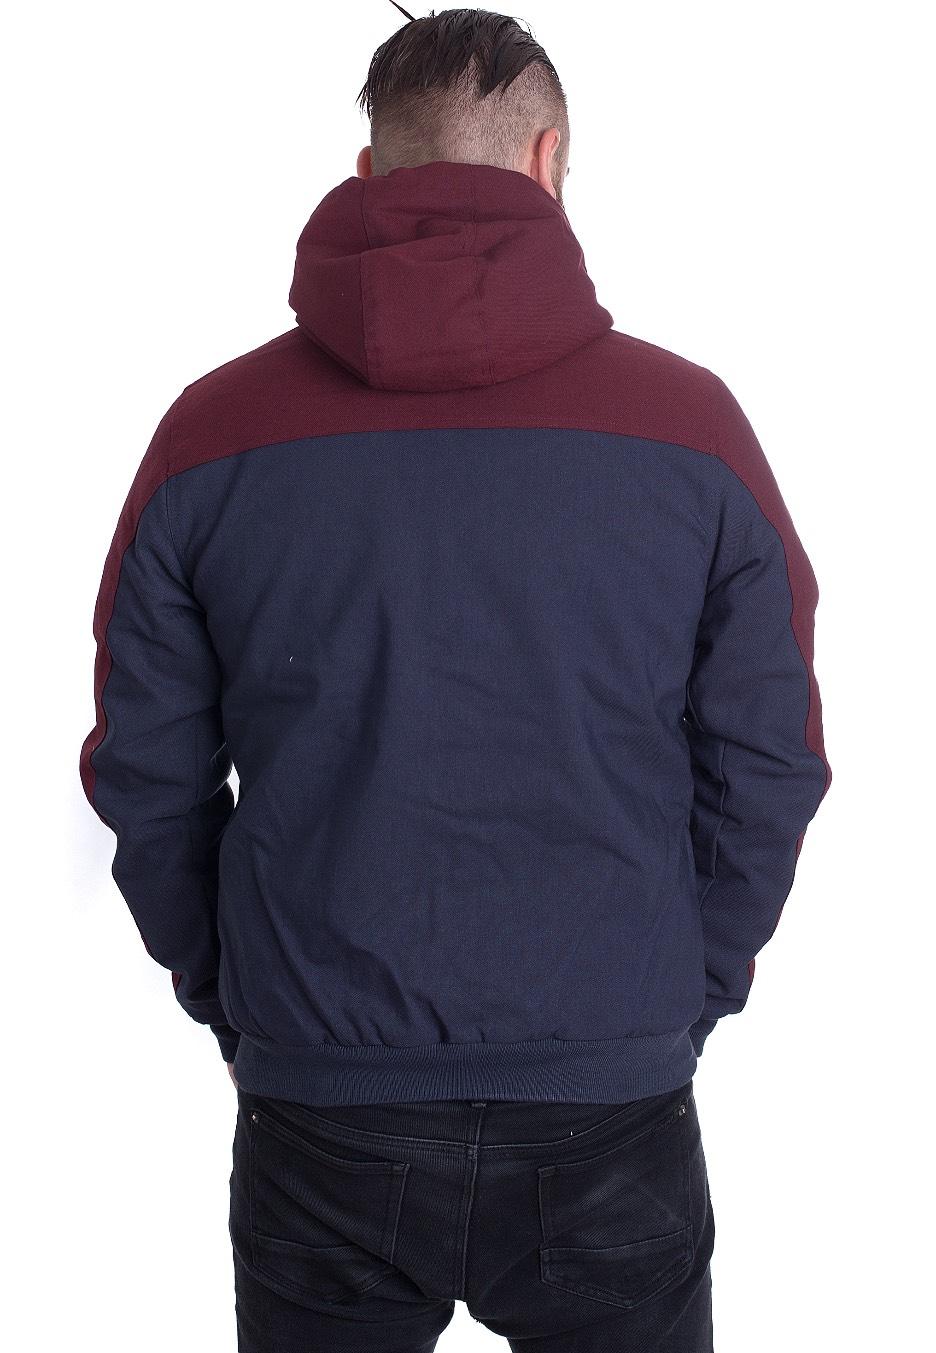 streetwear Veste NavyRed Iriedaily Dock36 Worker Boutique qxYpwRB0